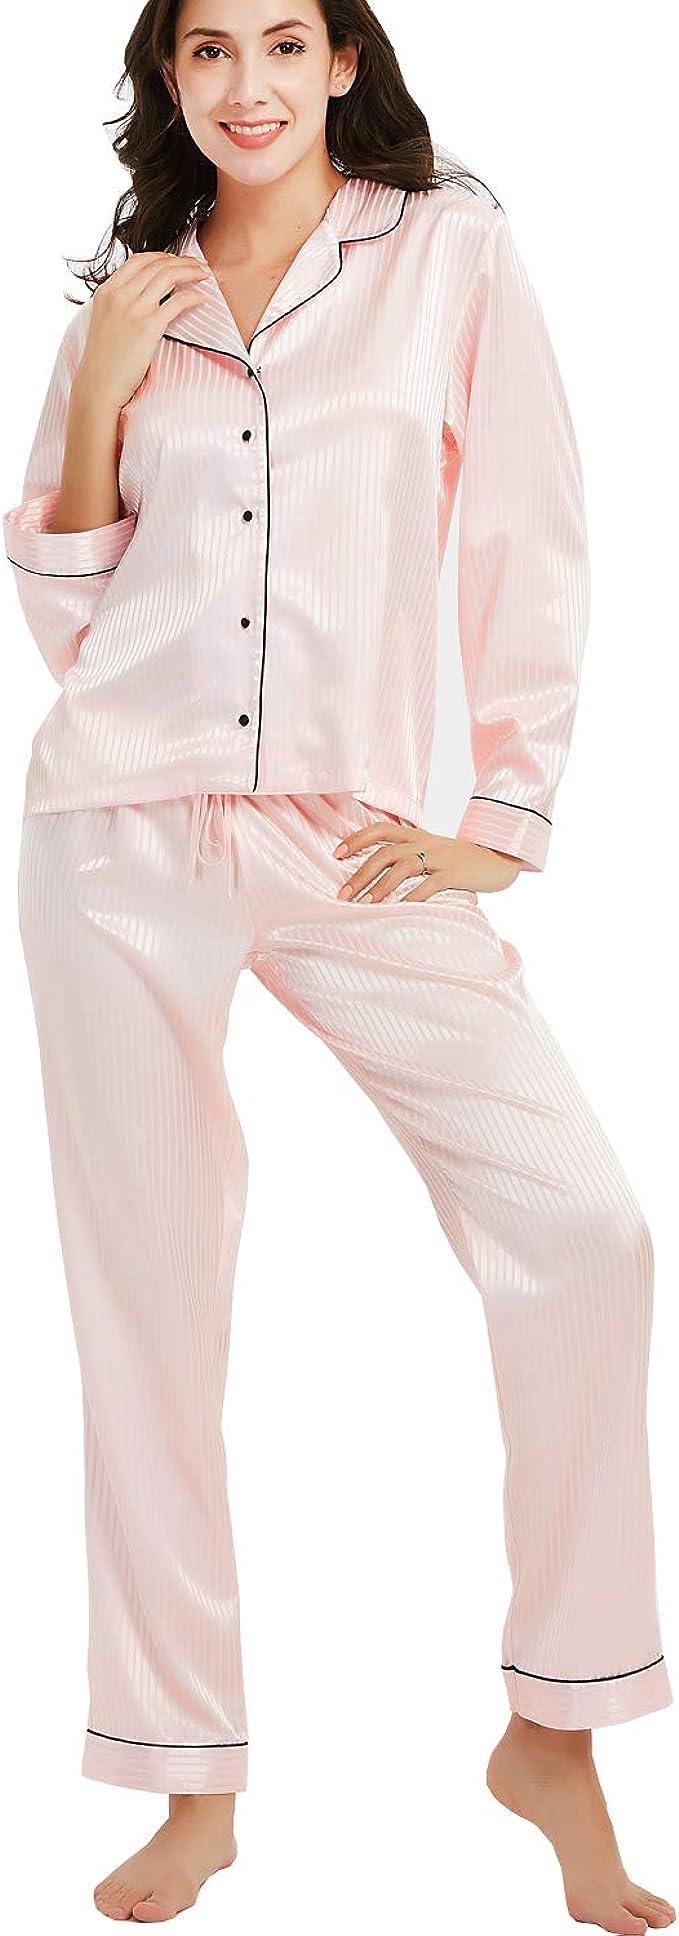 New Dance Pijamas Saten Mujer Manga Larga Set Ropa de Dormir Elegante Ladies Silk Pyjama Set Pijamas Sleepwear Loungewear